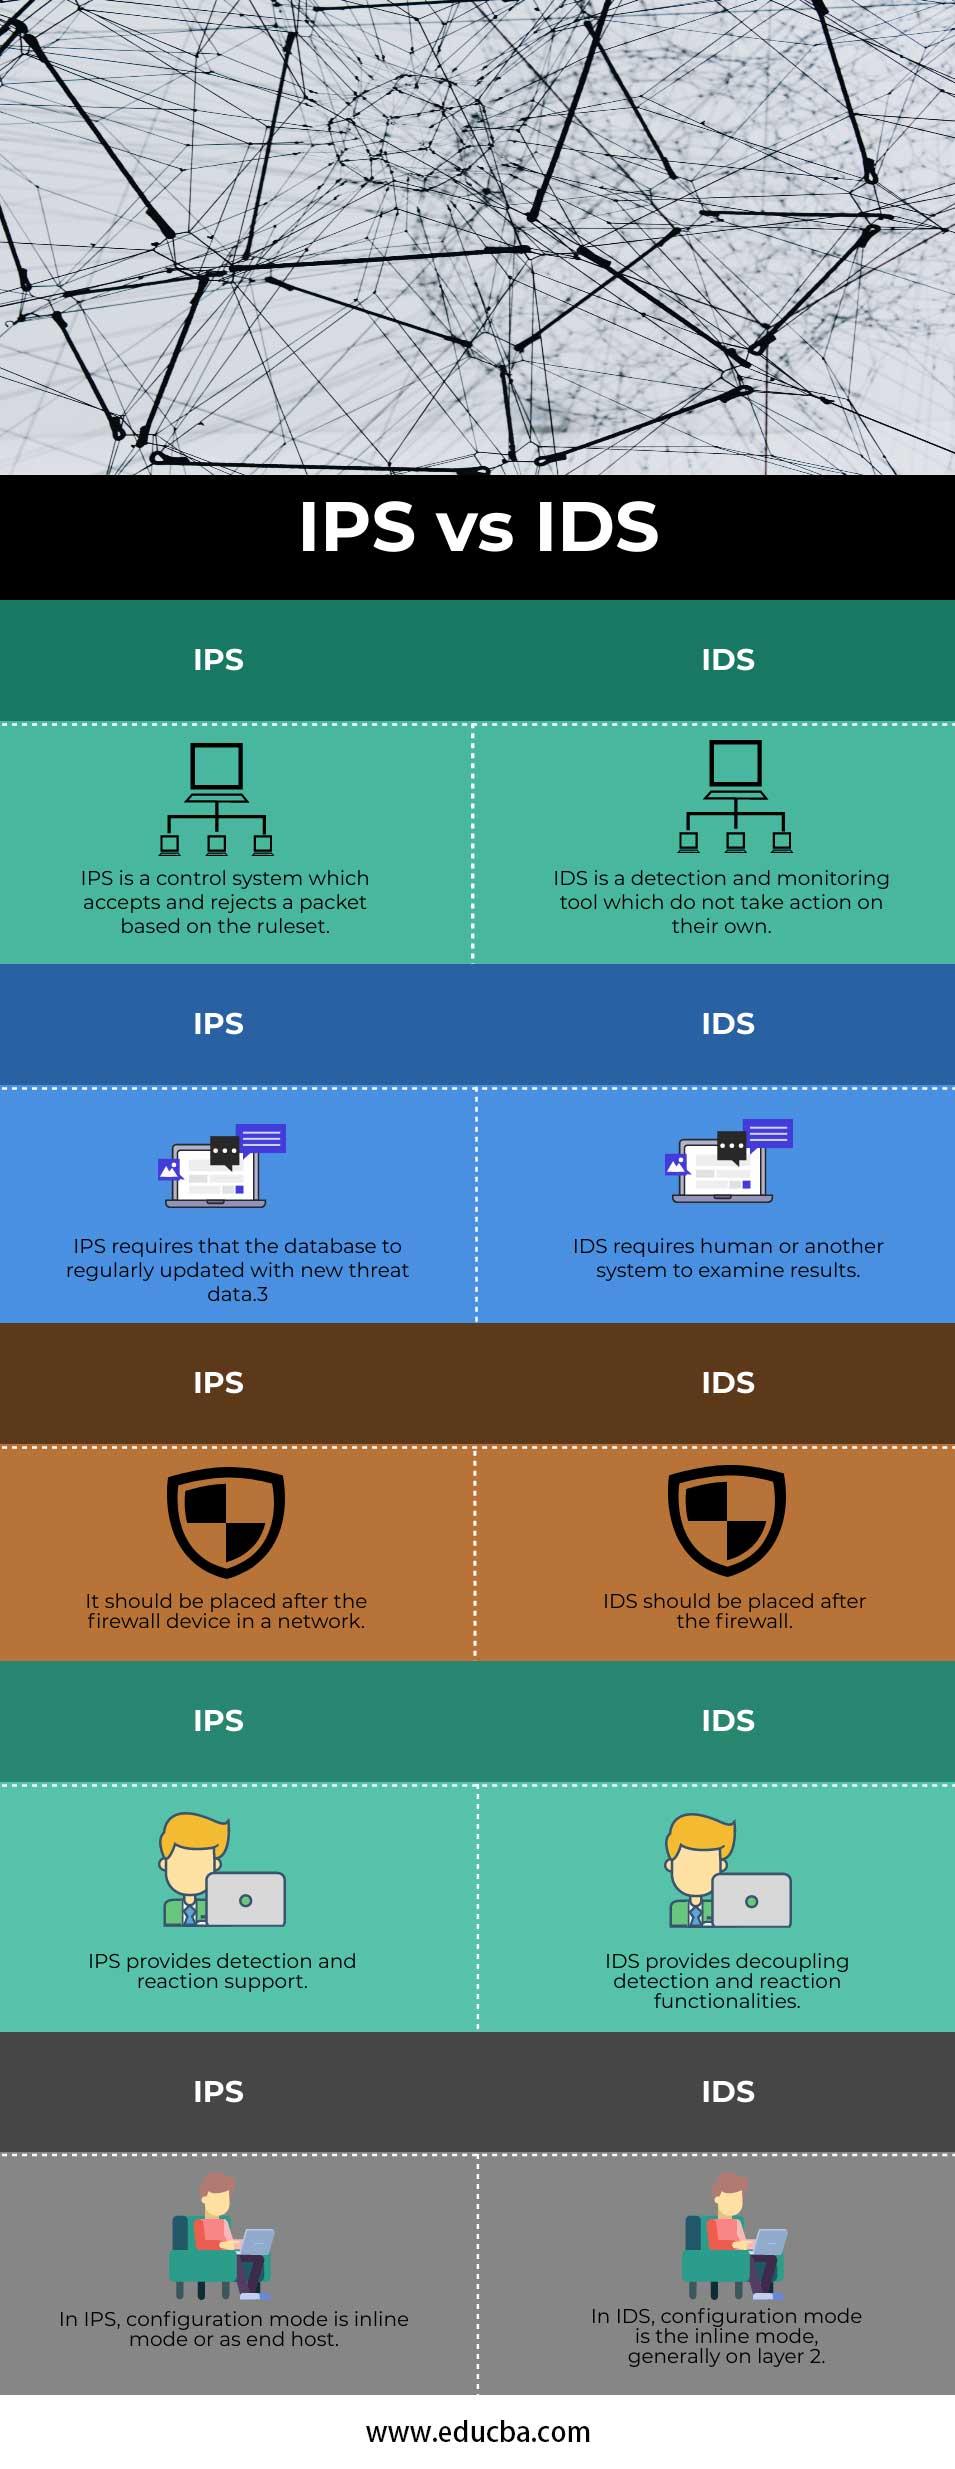 IPS vs IDS info